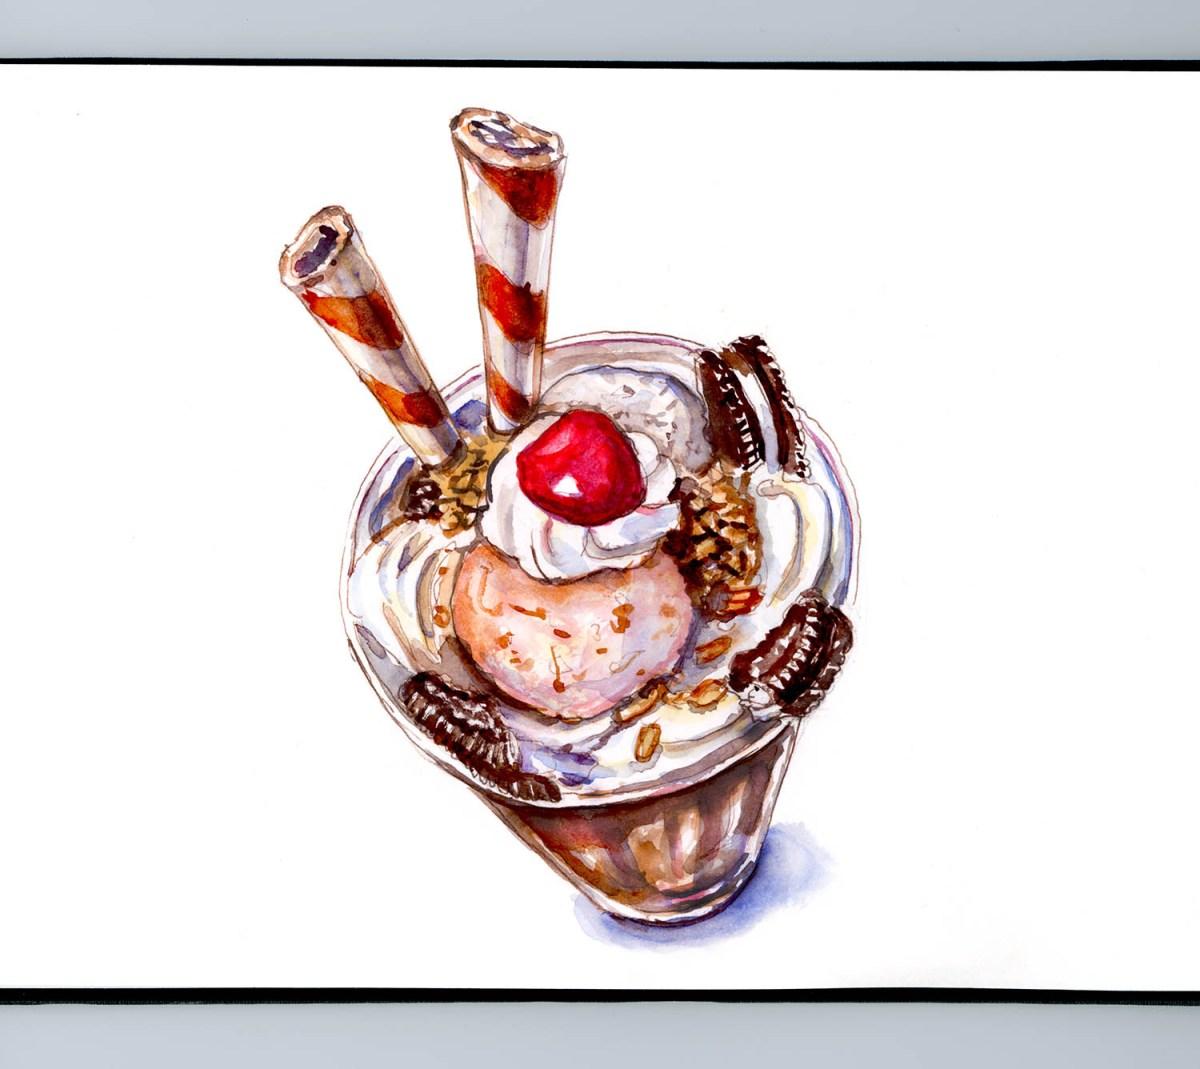 #WorldWatercolorGroup - Day 5 - Hot Fudge Sundae Oreo Cookie - Doodlewash